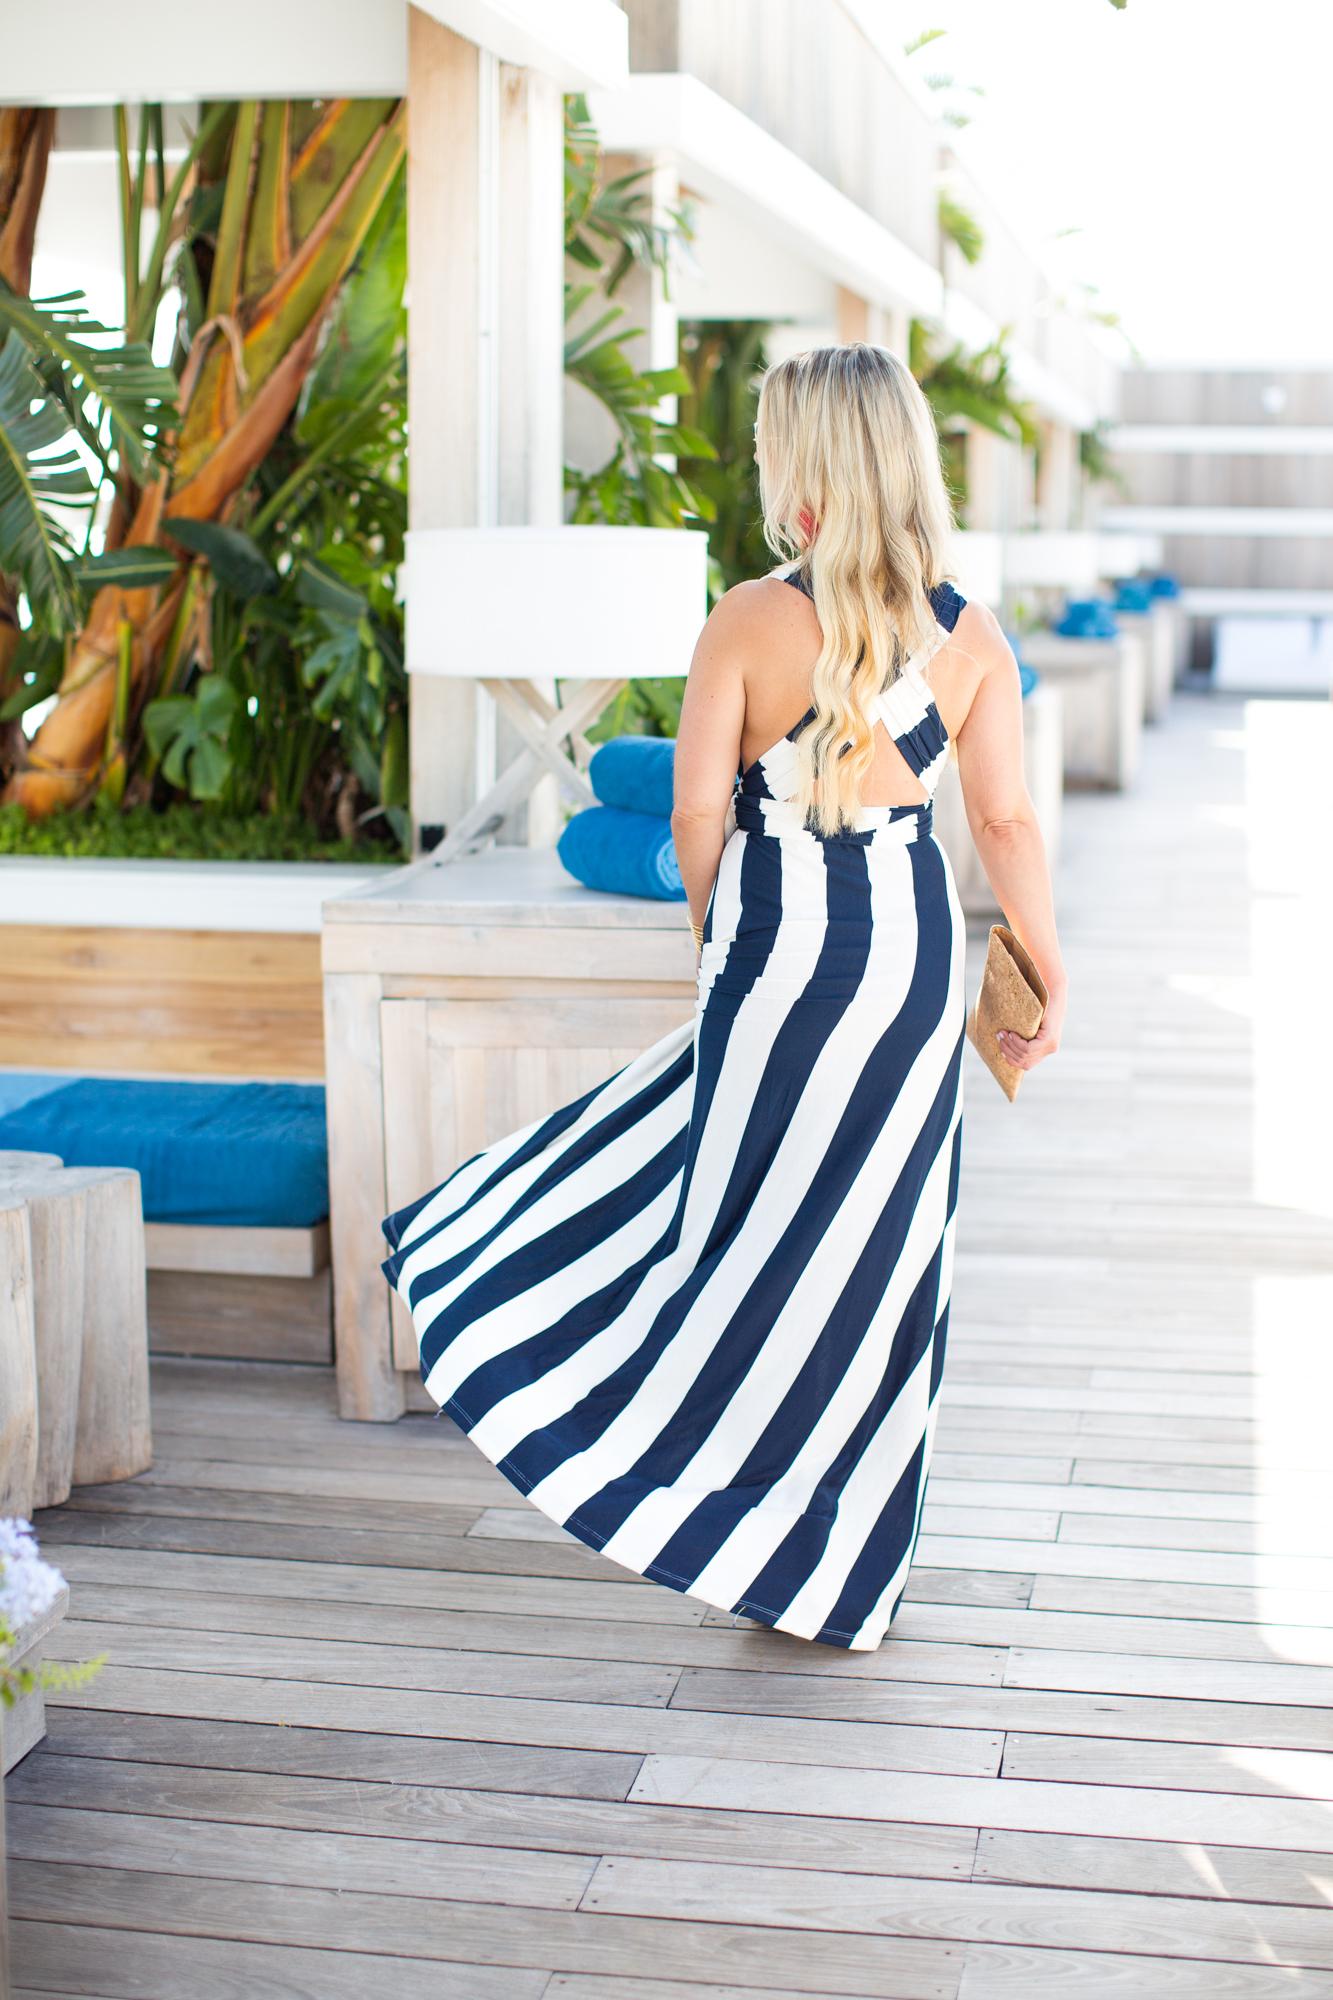 Nautical Striped Dress   The Darling Petite Diva   Nicole Kirk   Dallas Blogger